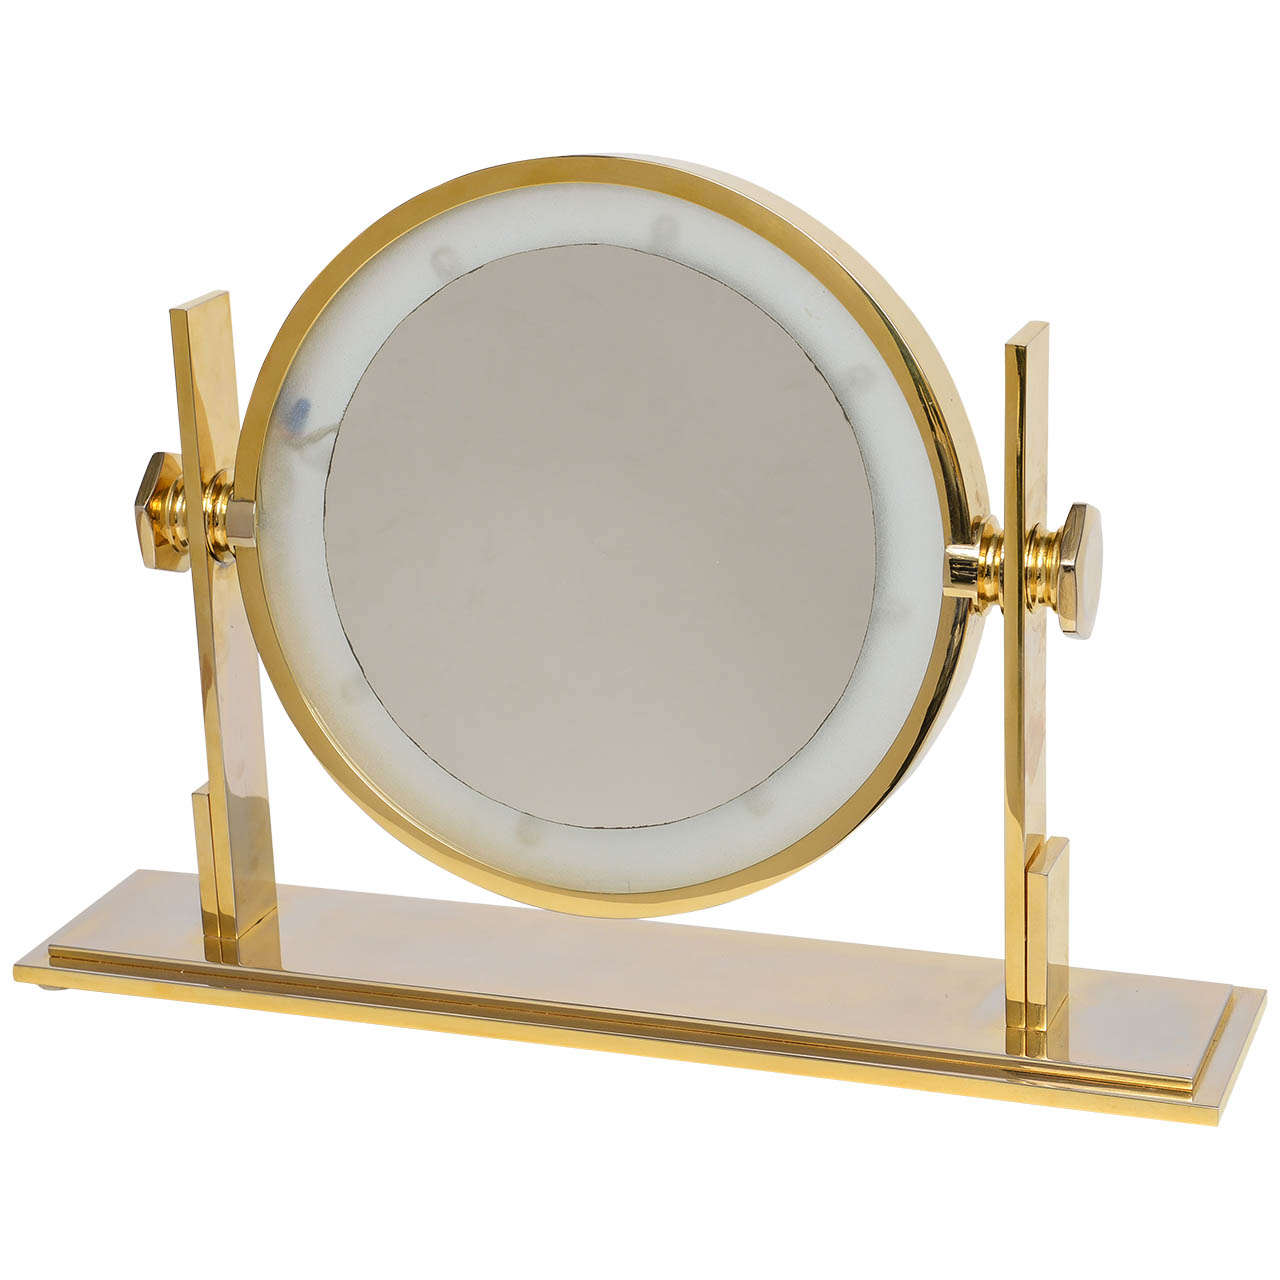 Tabletop vanity mirror gold vanity ideas karl springer lighted table top vanity mirror at 1stdibs aloadofball Choice Image